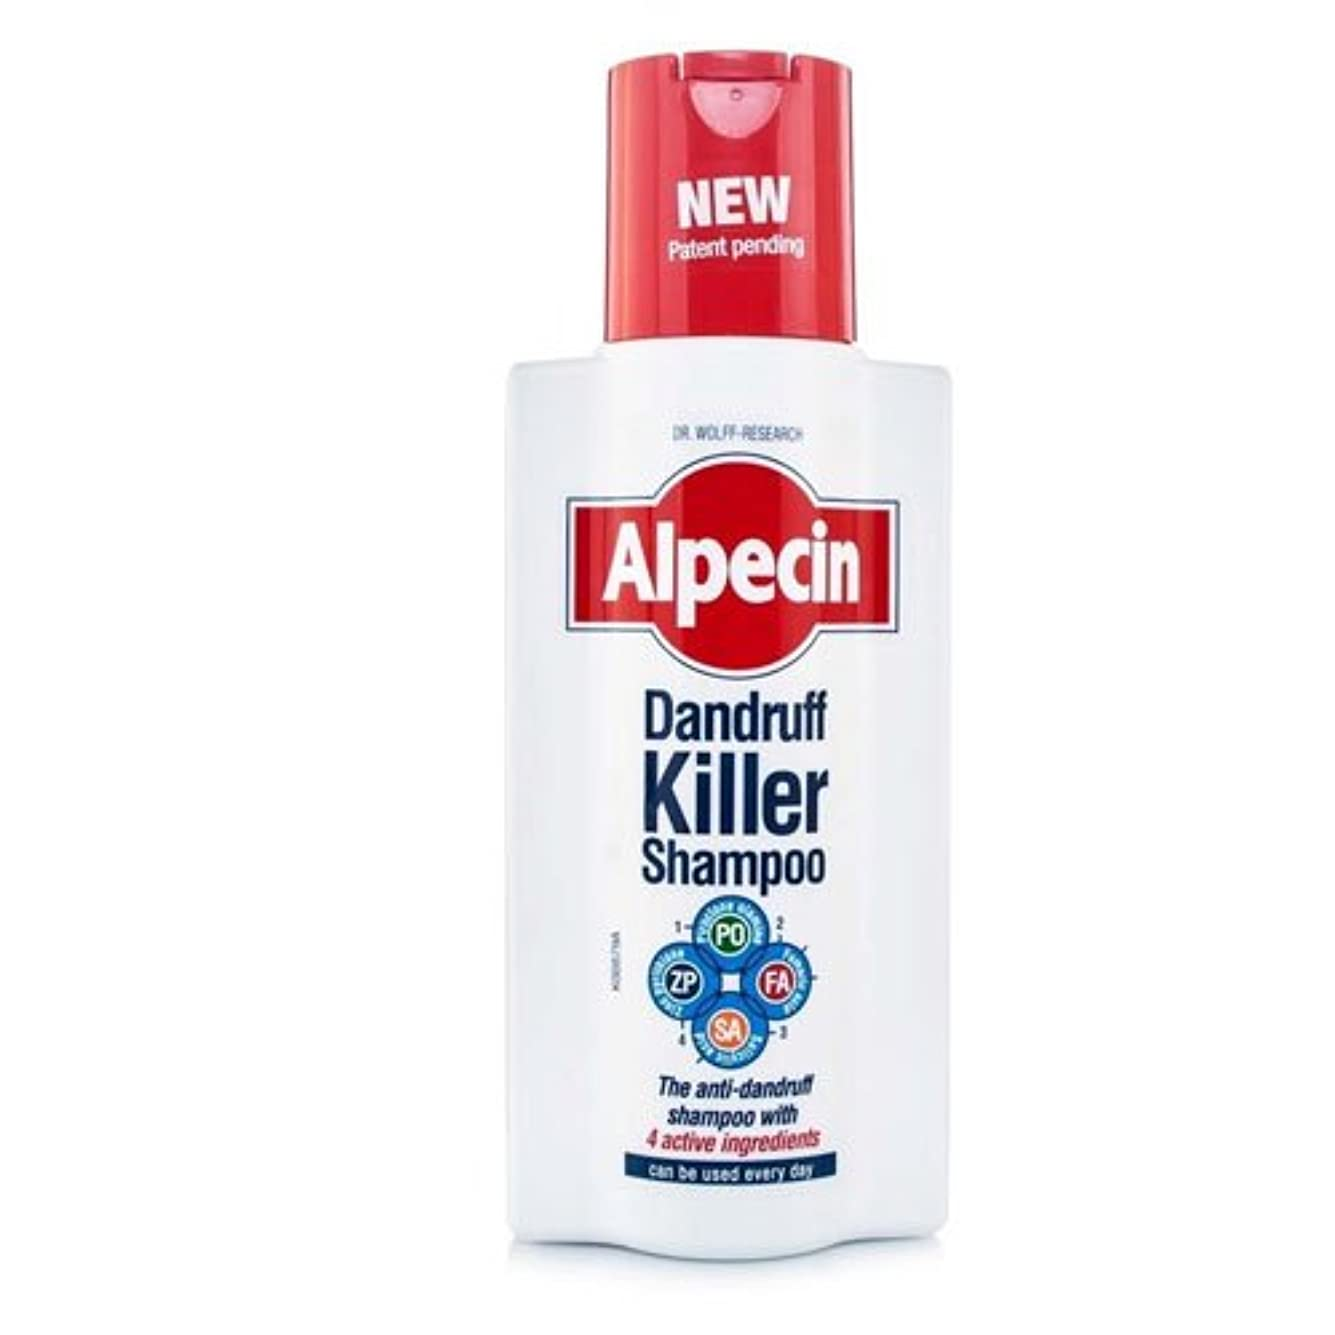 分割側溝土器Alpecin Dandruff Killer Shampoo 250 ml by Alpecin [並行輸入品]